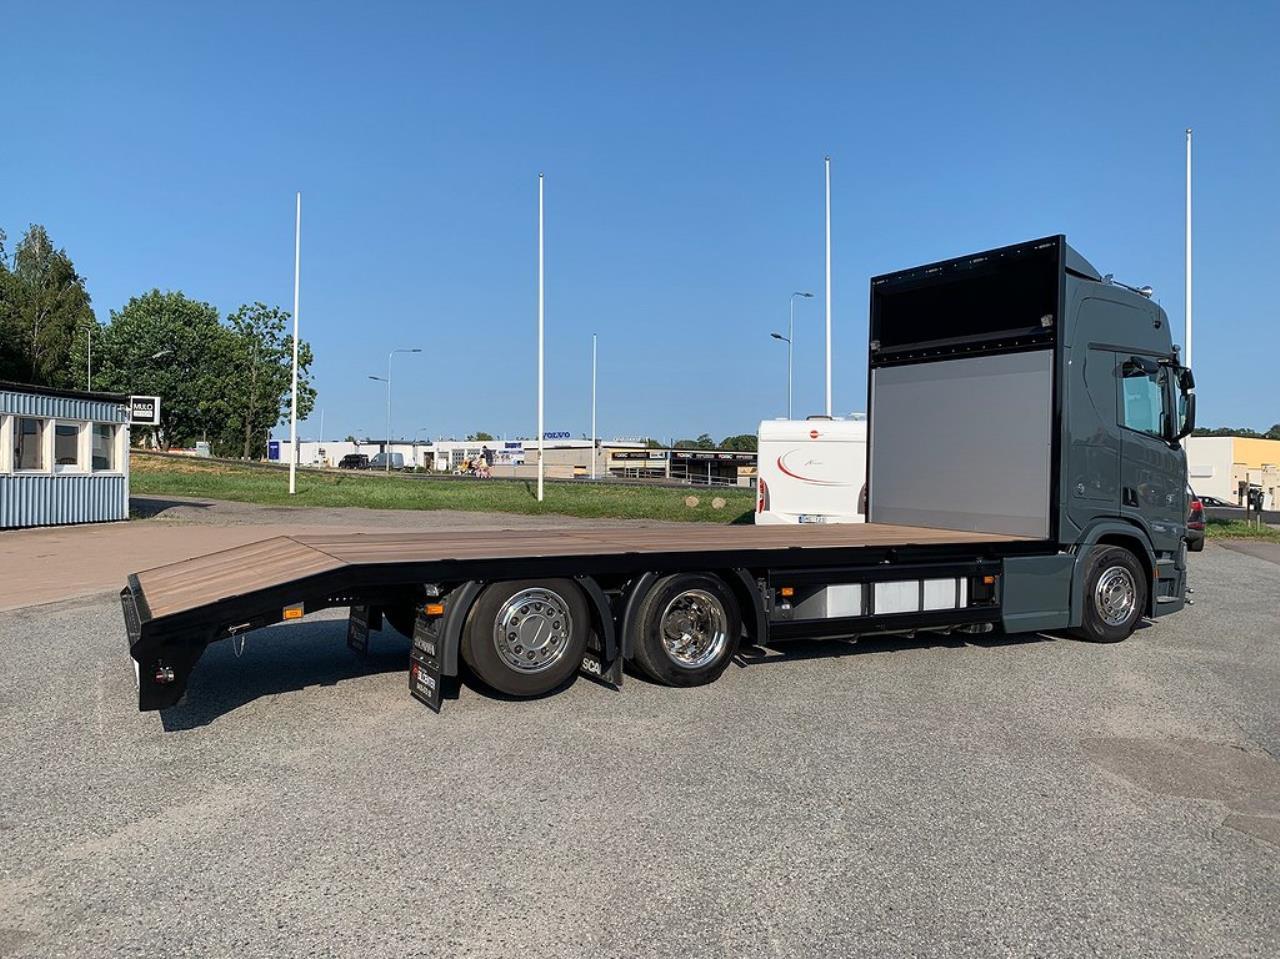 Scania R650 V8 6x2 Maskintransport  2018 - Maskintransport